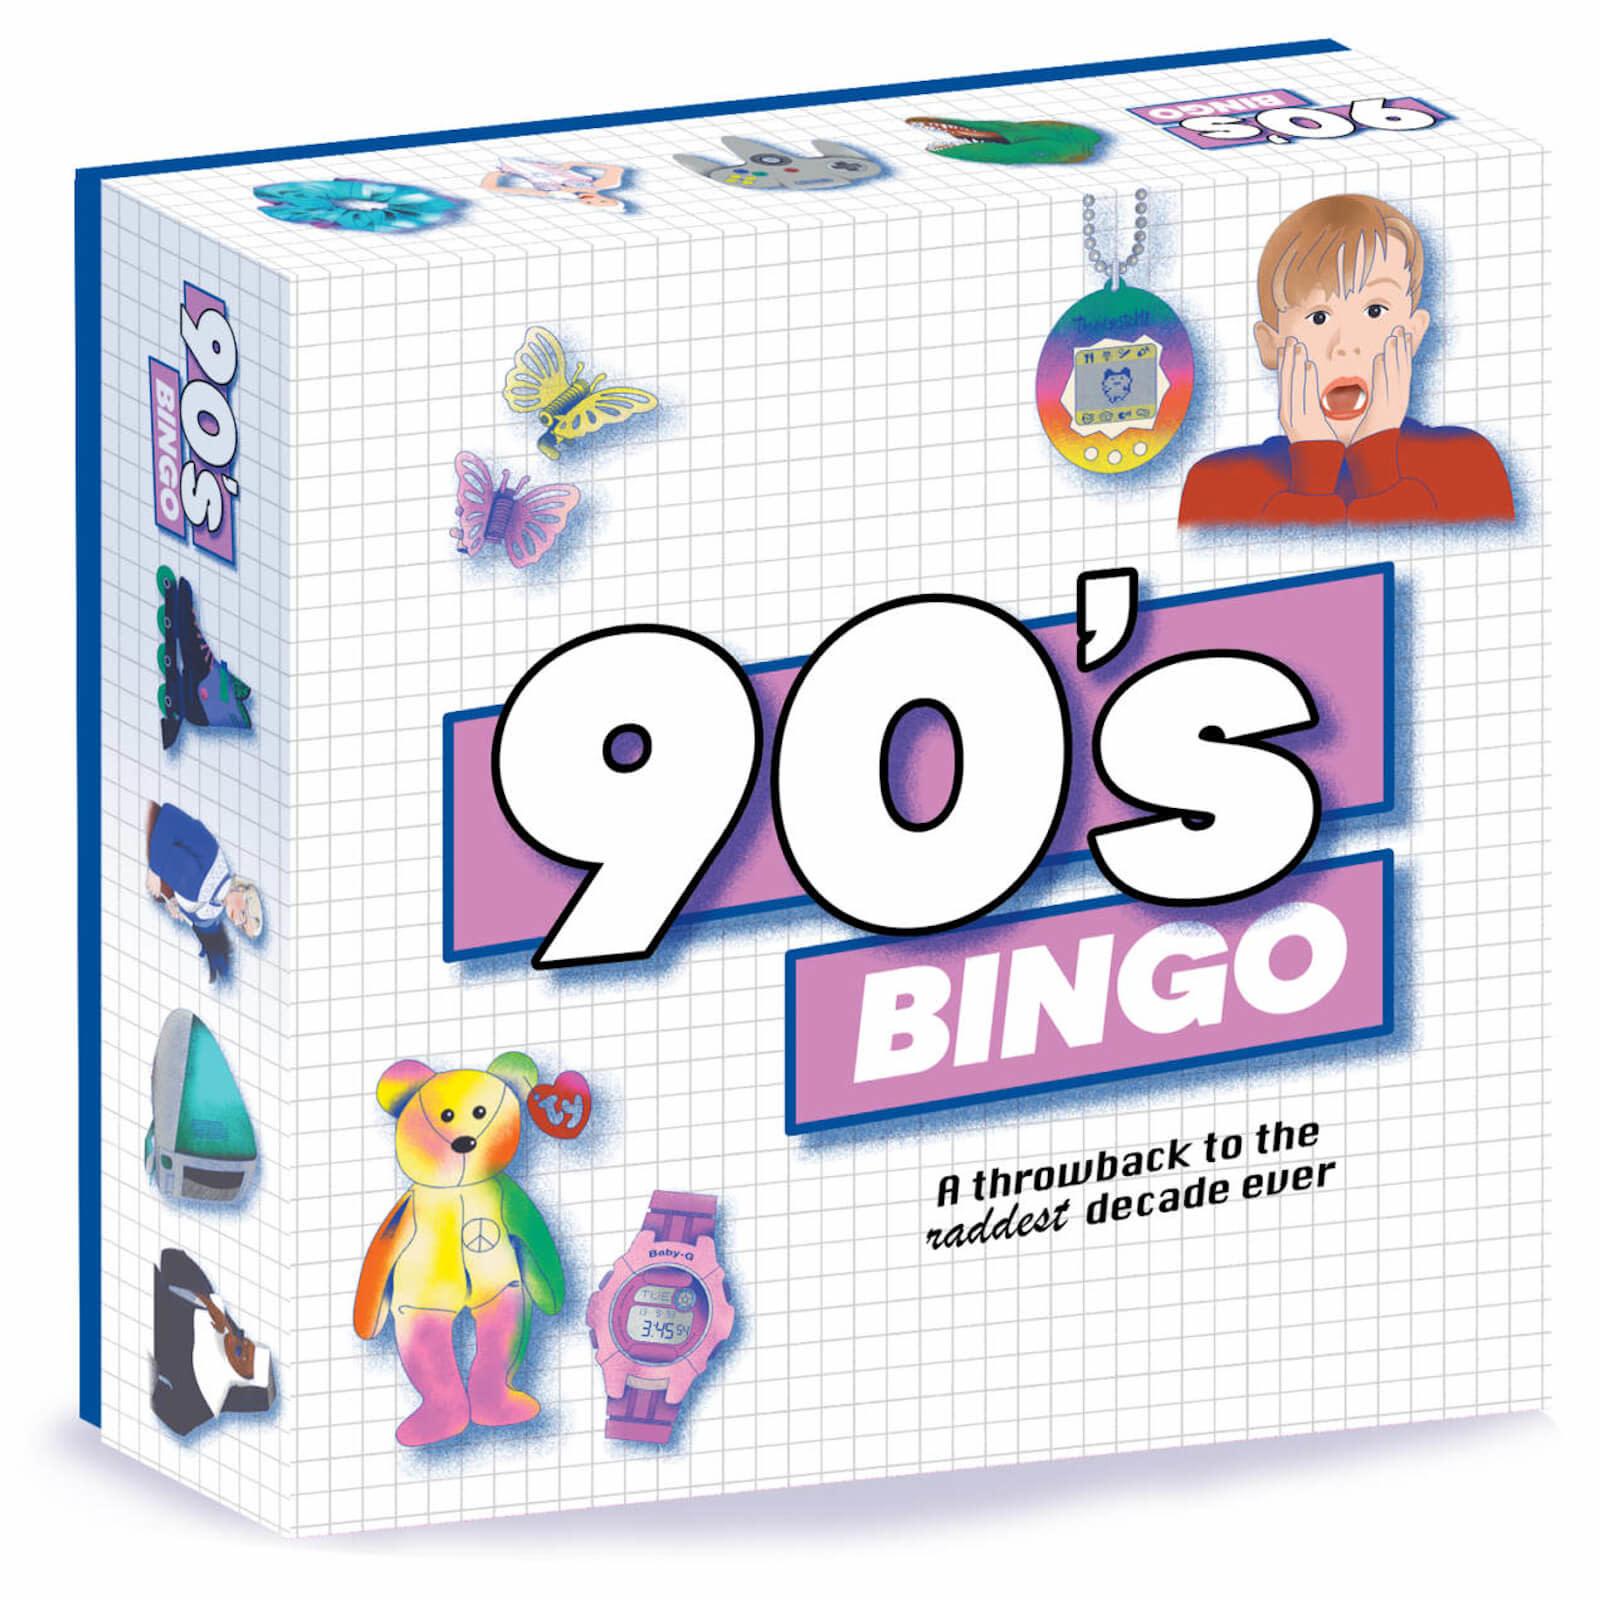 90's Bingo - A Throwback to the Raddest Decade Ever